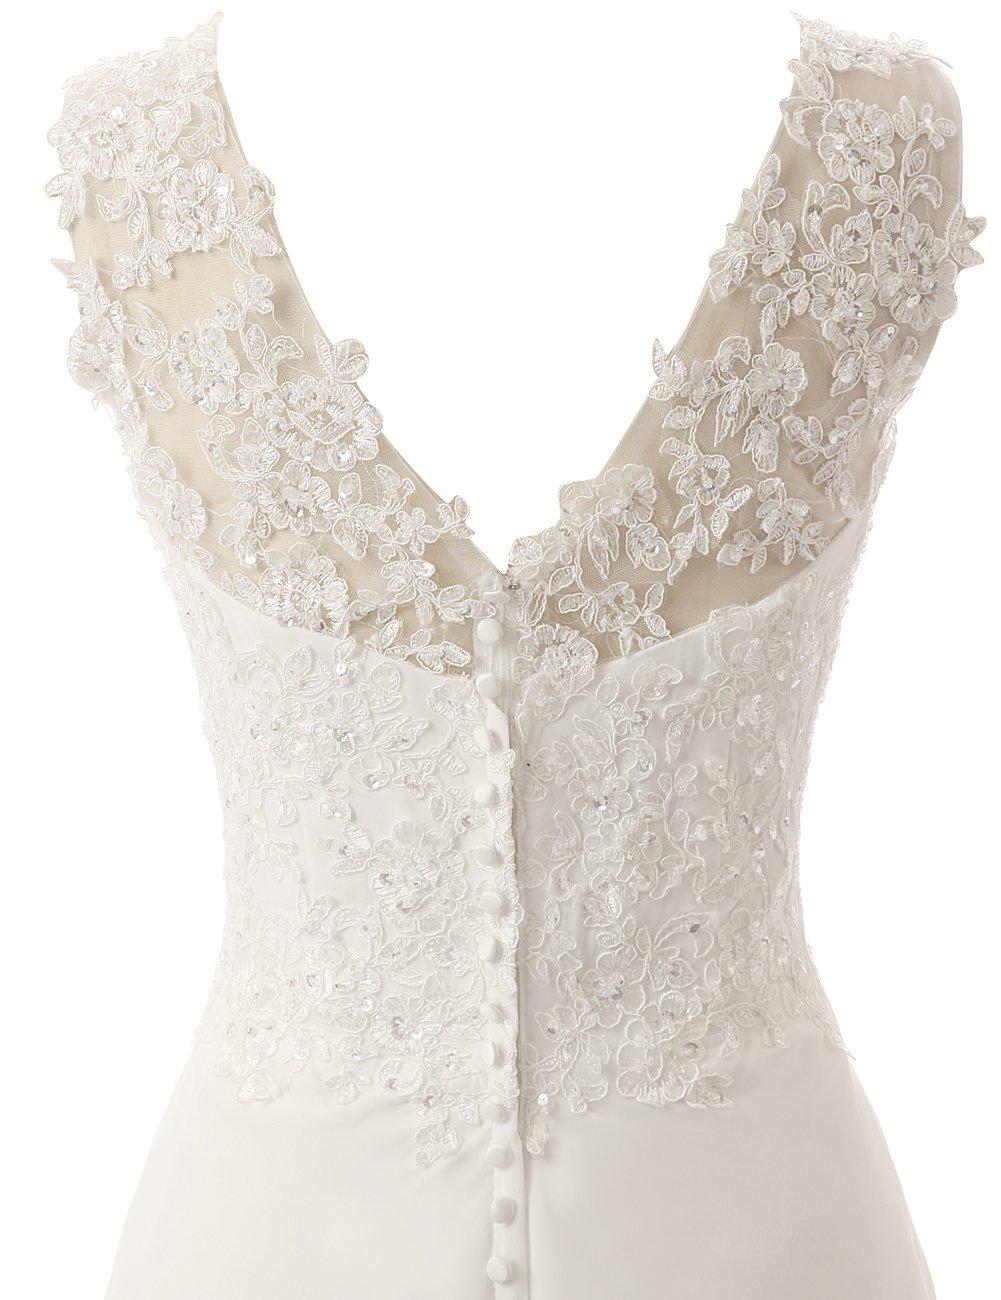 JAEDEN Elegant Lace Beach Wedding Dresses Chiffon V Neck A Line Long Bridal Gown White US22W by JAEDEN (Image #5)